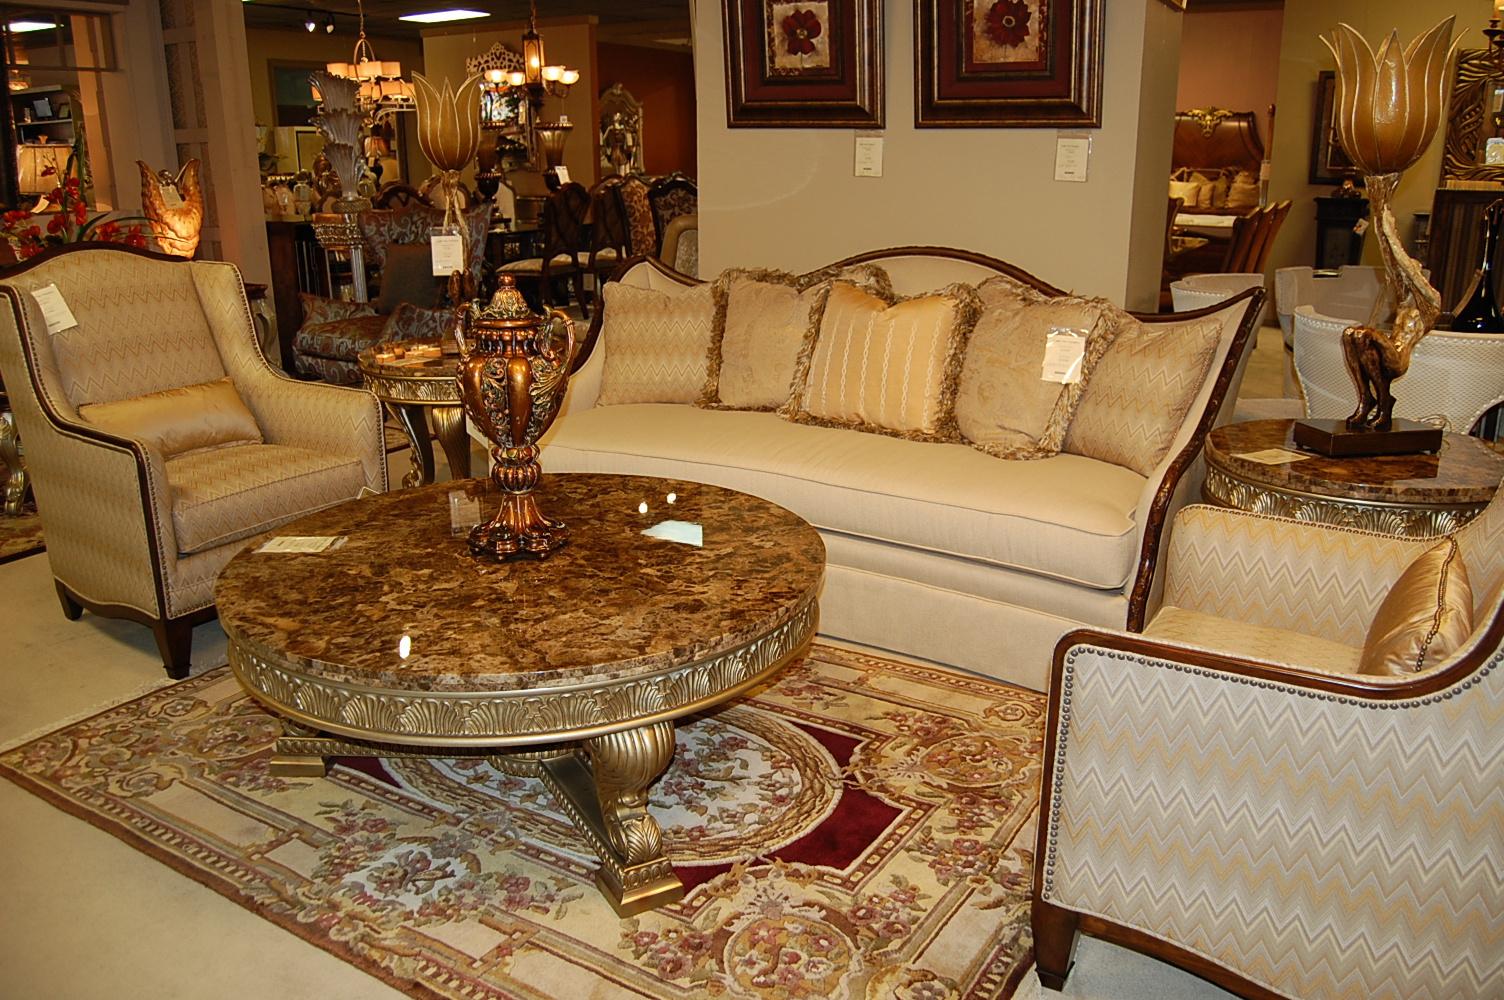 Living Room Furniture Sale Houston, TX   Luxury Furniture, Unique Bedroom Furniture